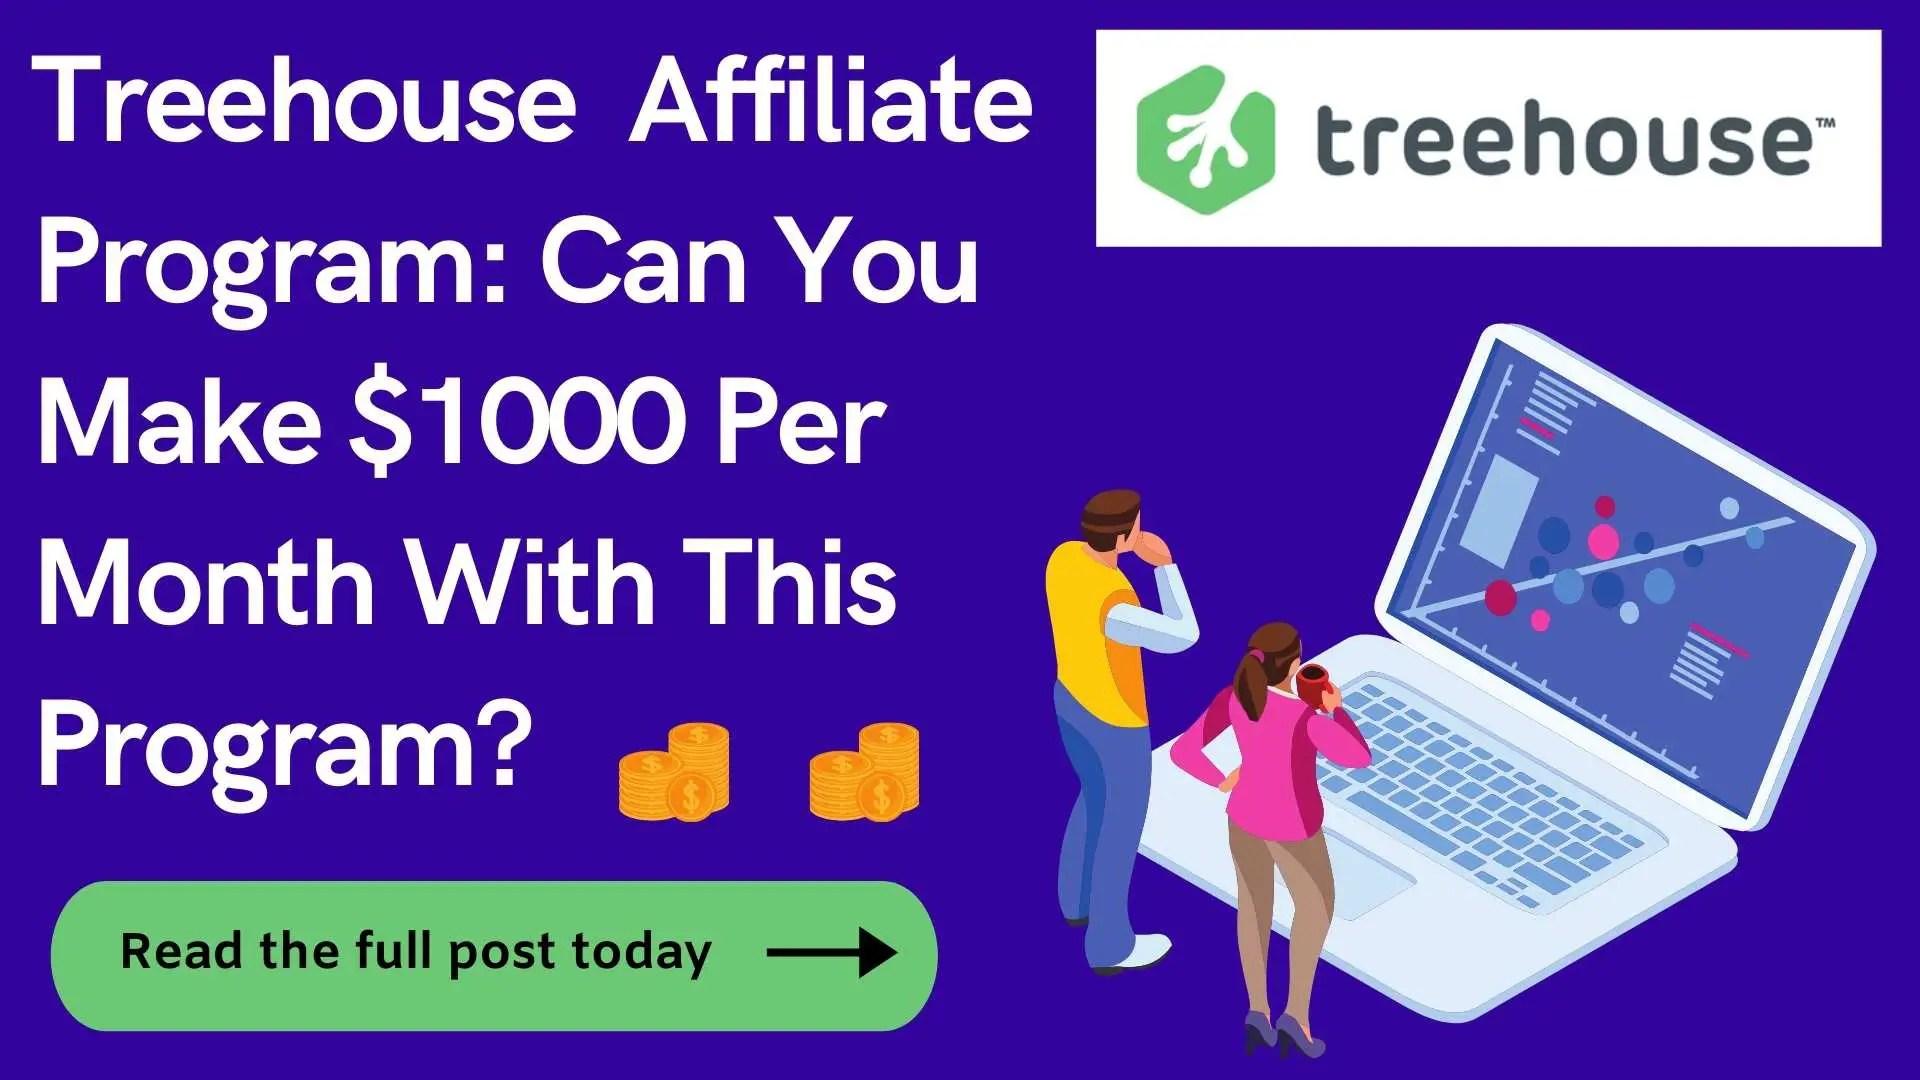 Treehouse Affiliate Program